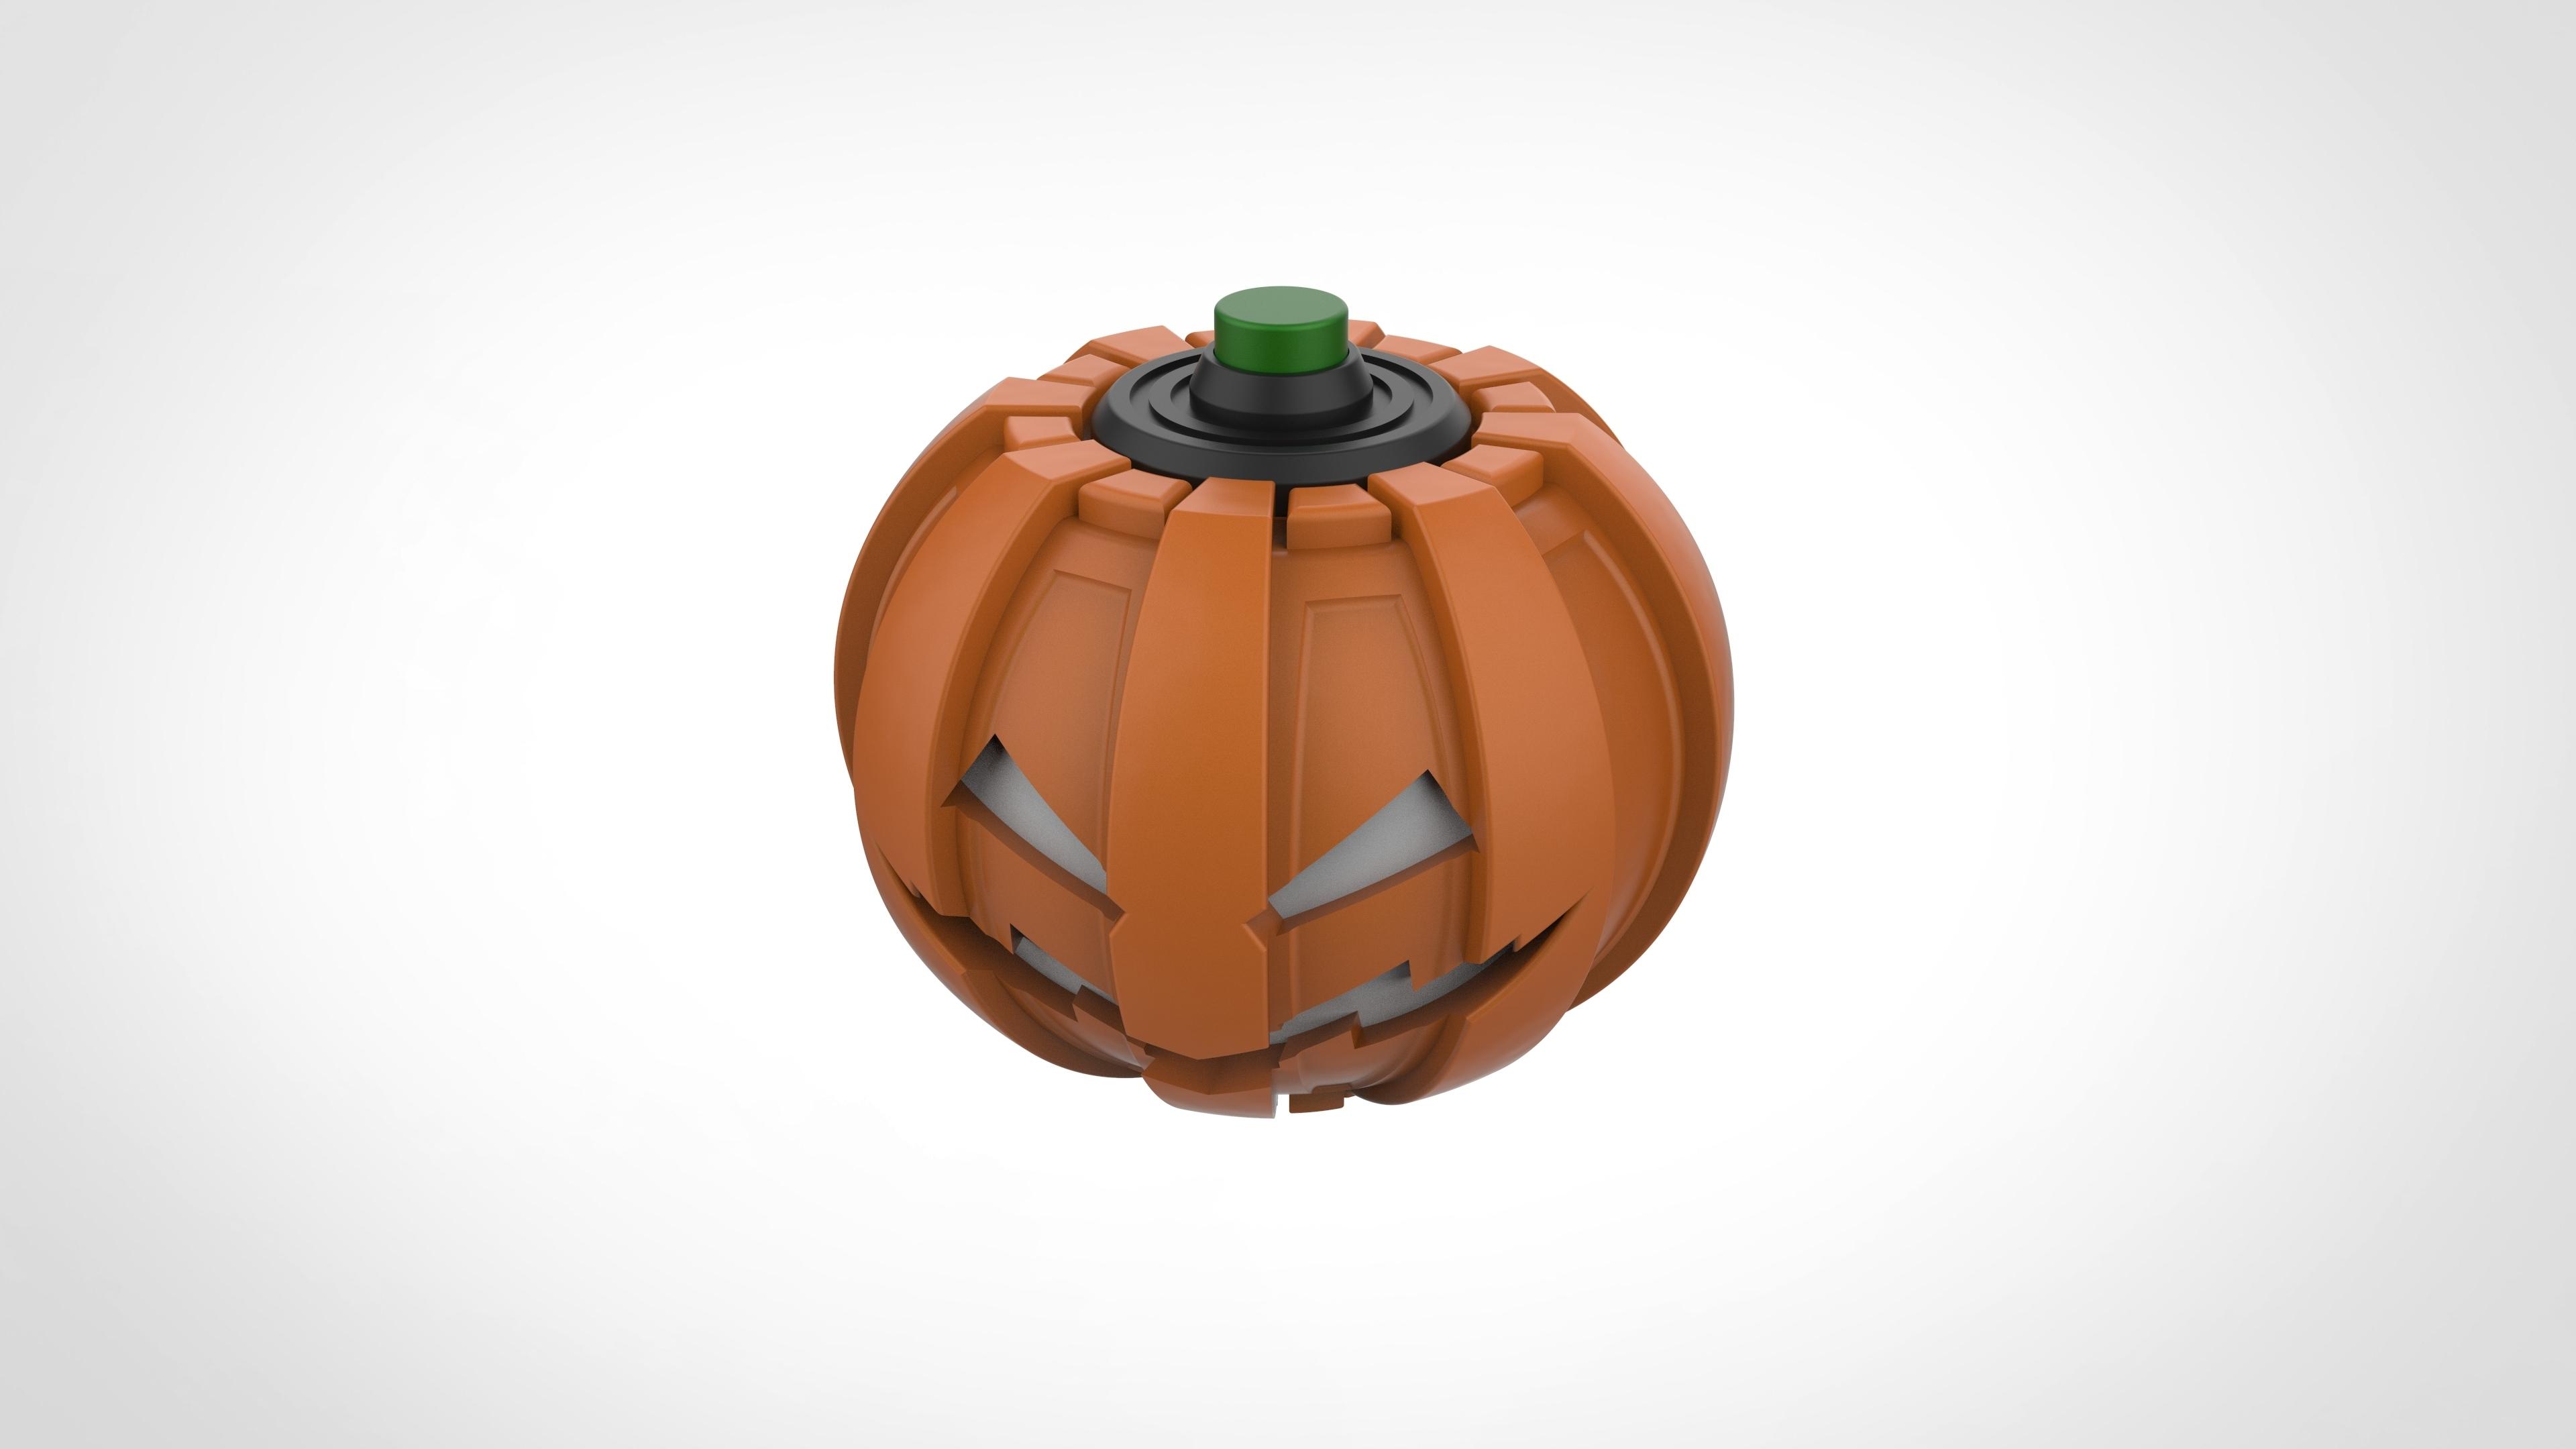 014.jpg Download 3MF file Green goblin bombs from the Spide-Man comics • 3D print model, vetrock